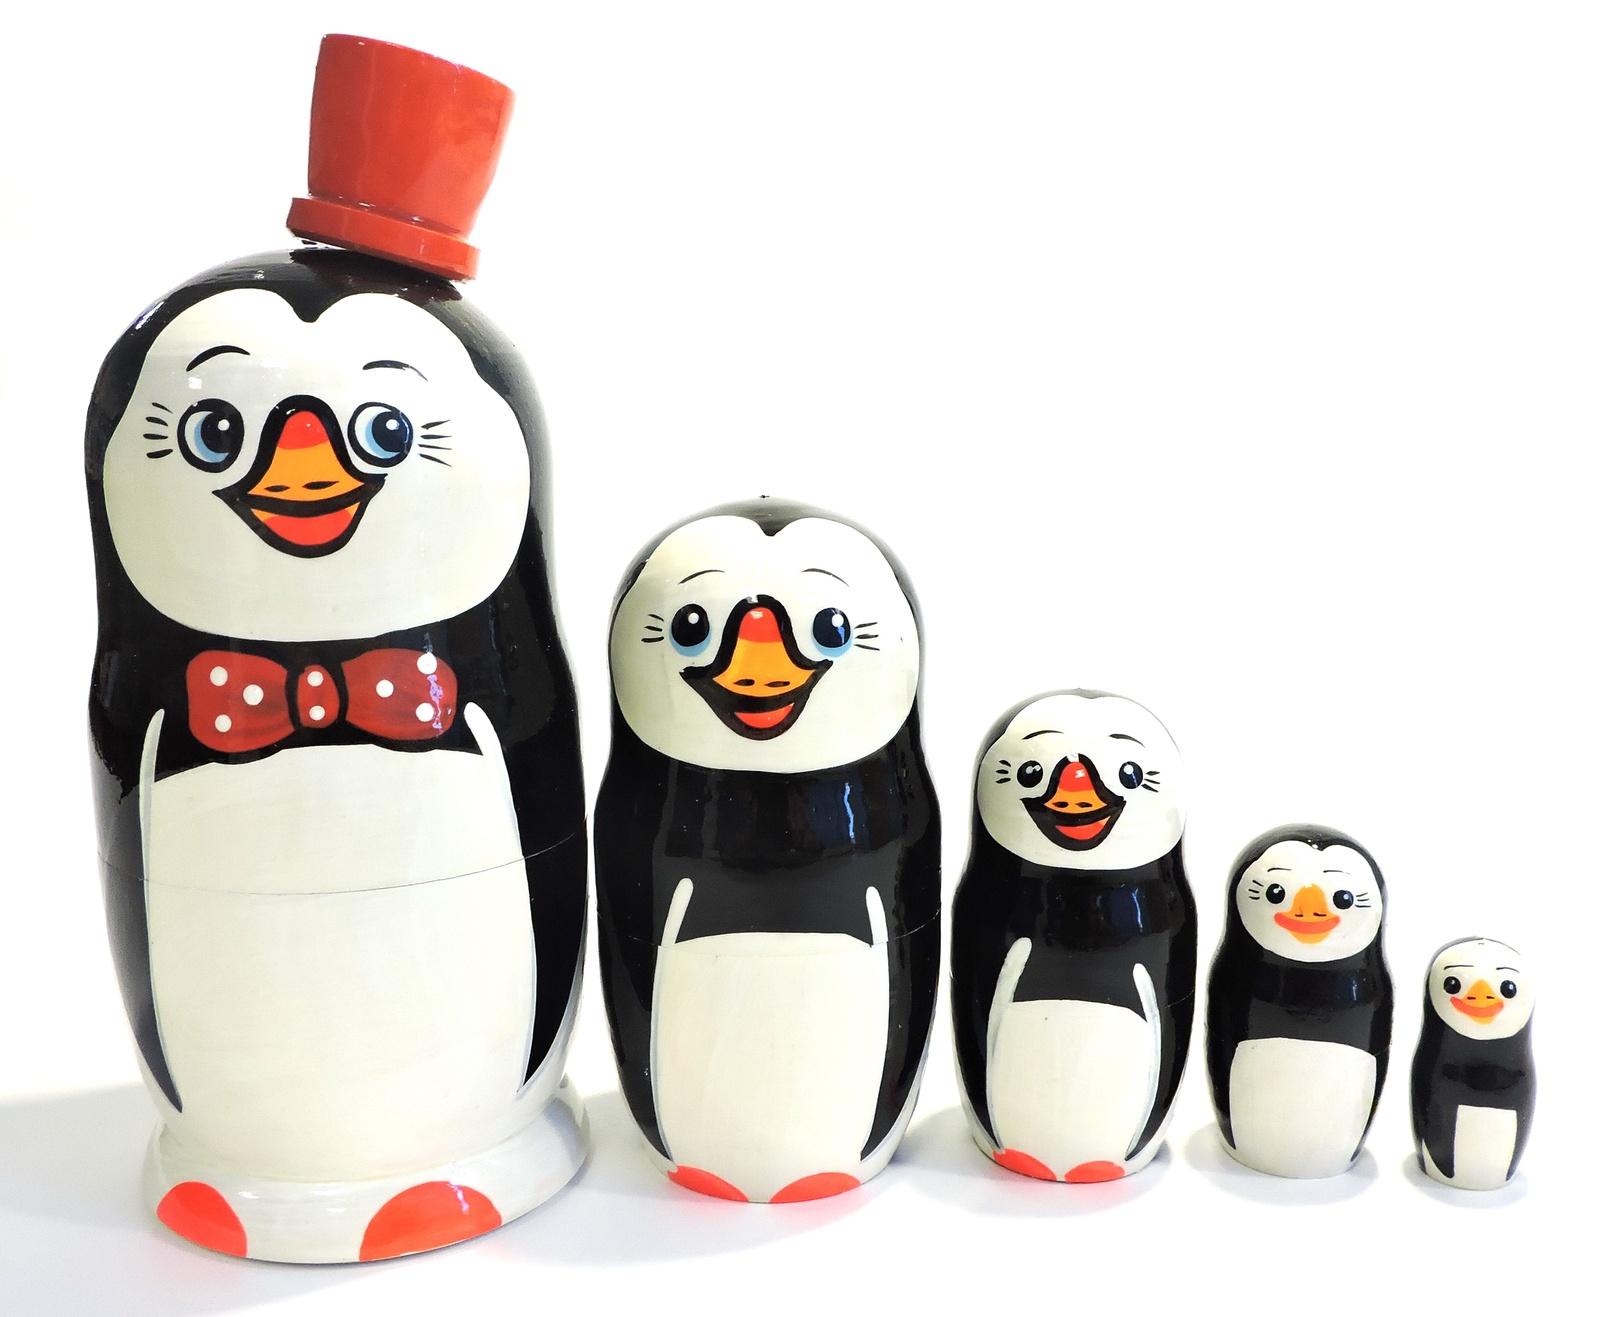 Матрешка Taowa Пингвины, из 5 кукол, 045-128-5, оранжевый, черный, 7,5 х 7,5 х 17,5 см цена